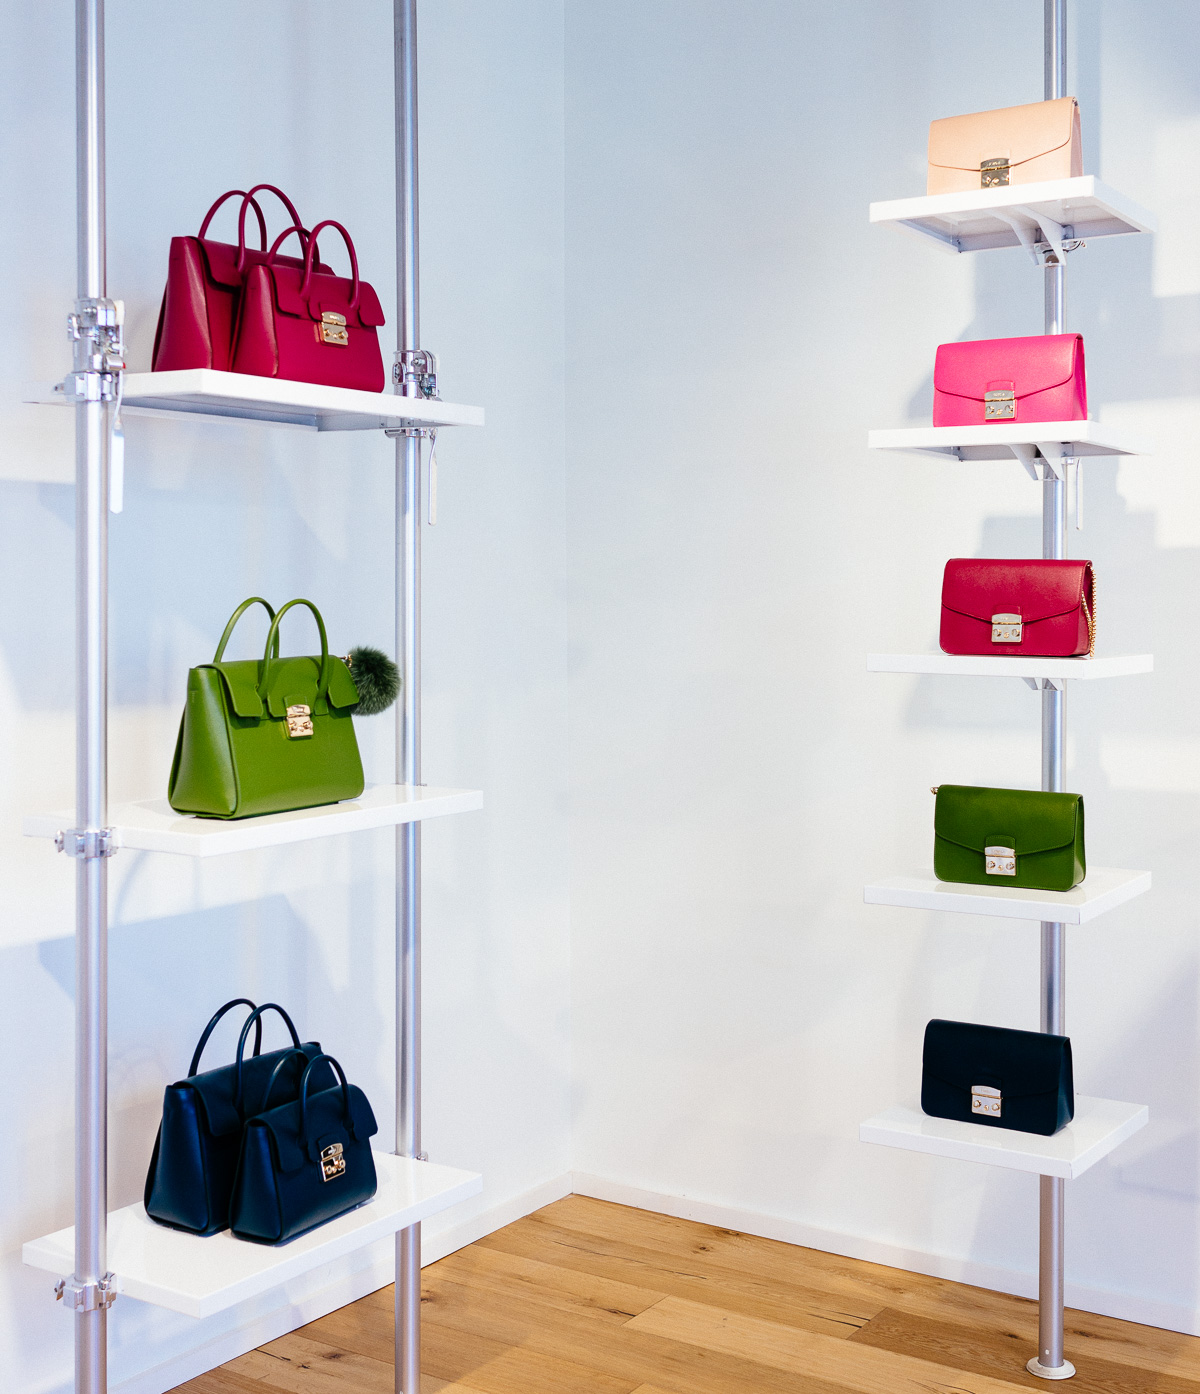 Furla Fall 2016 Bags (6)